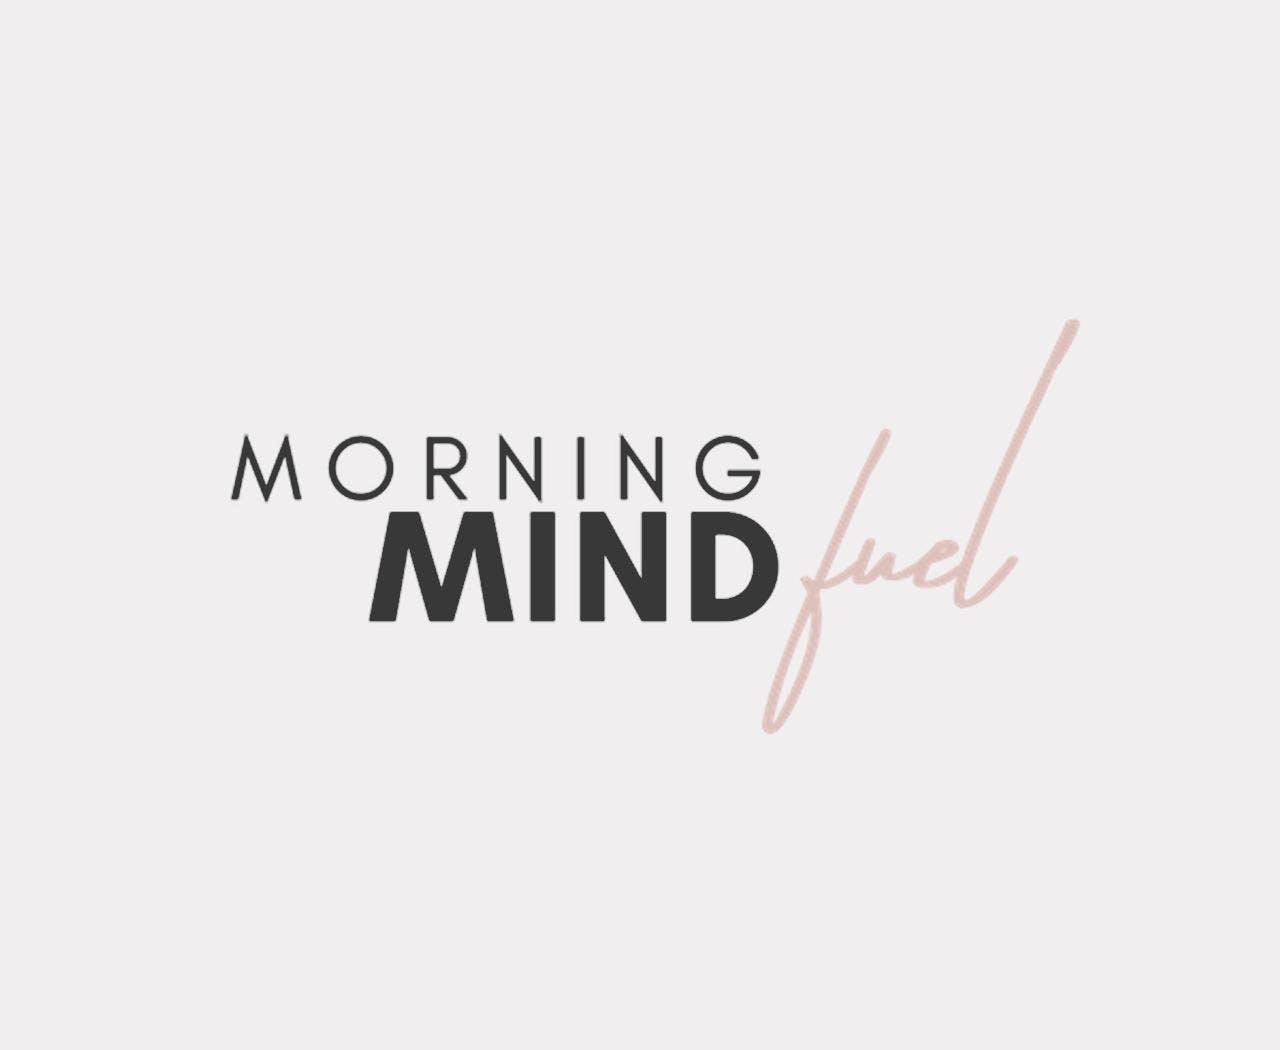 Dames Collective Phoenix - Morning MindFUEL - Branding